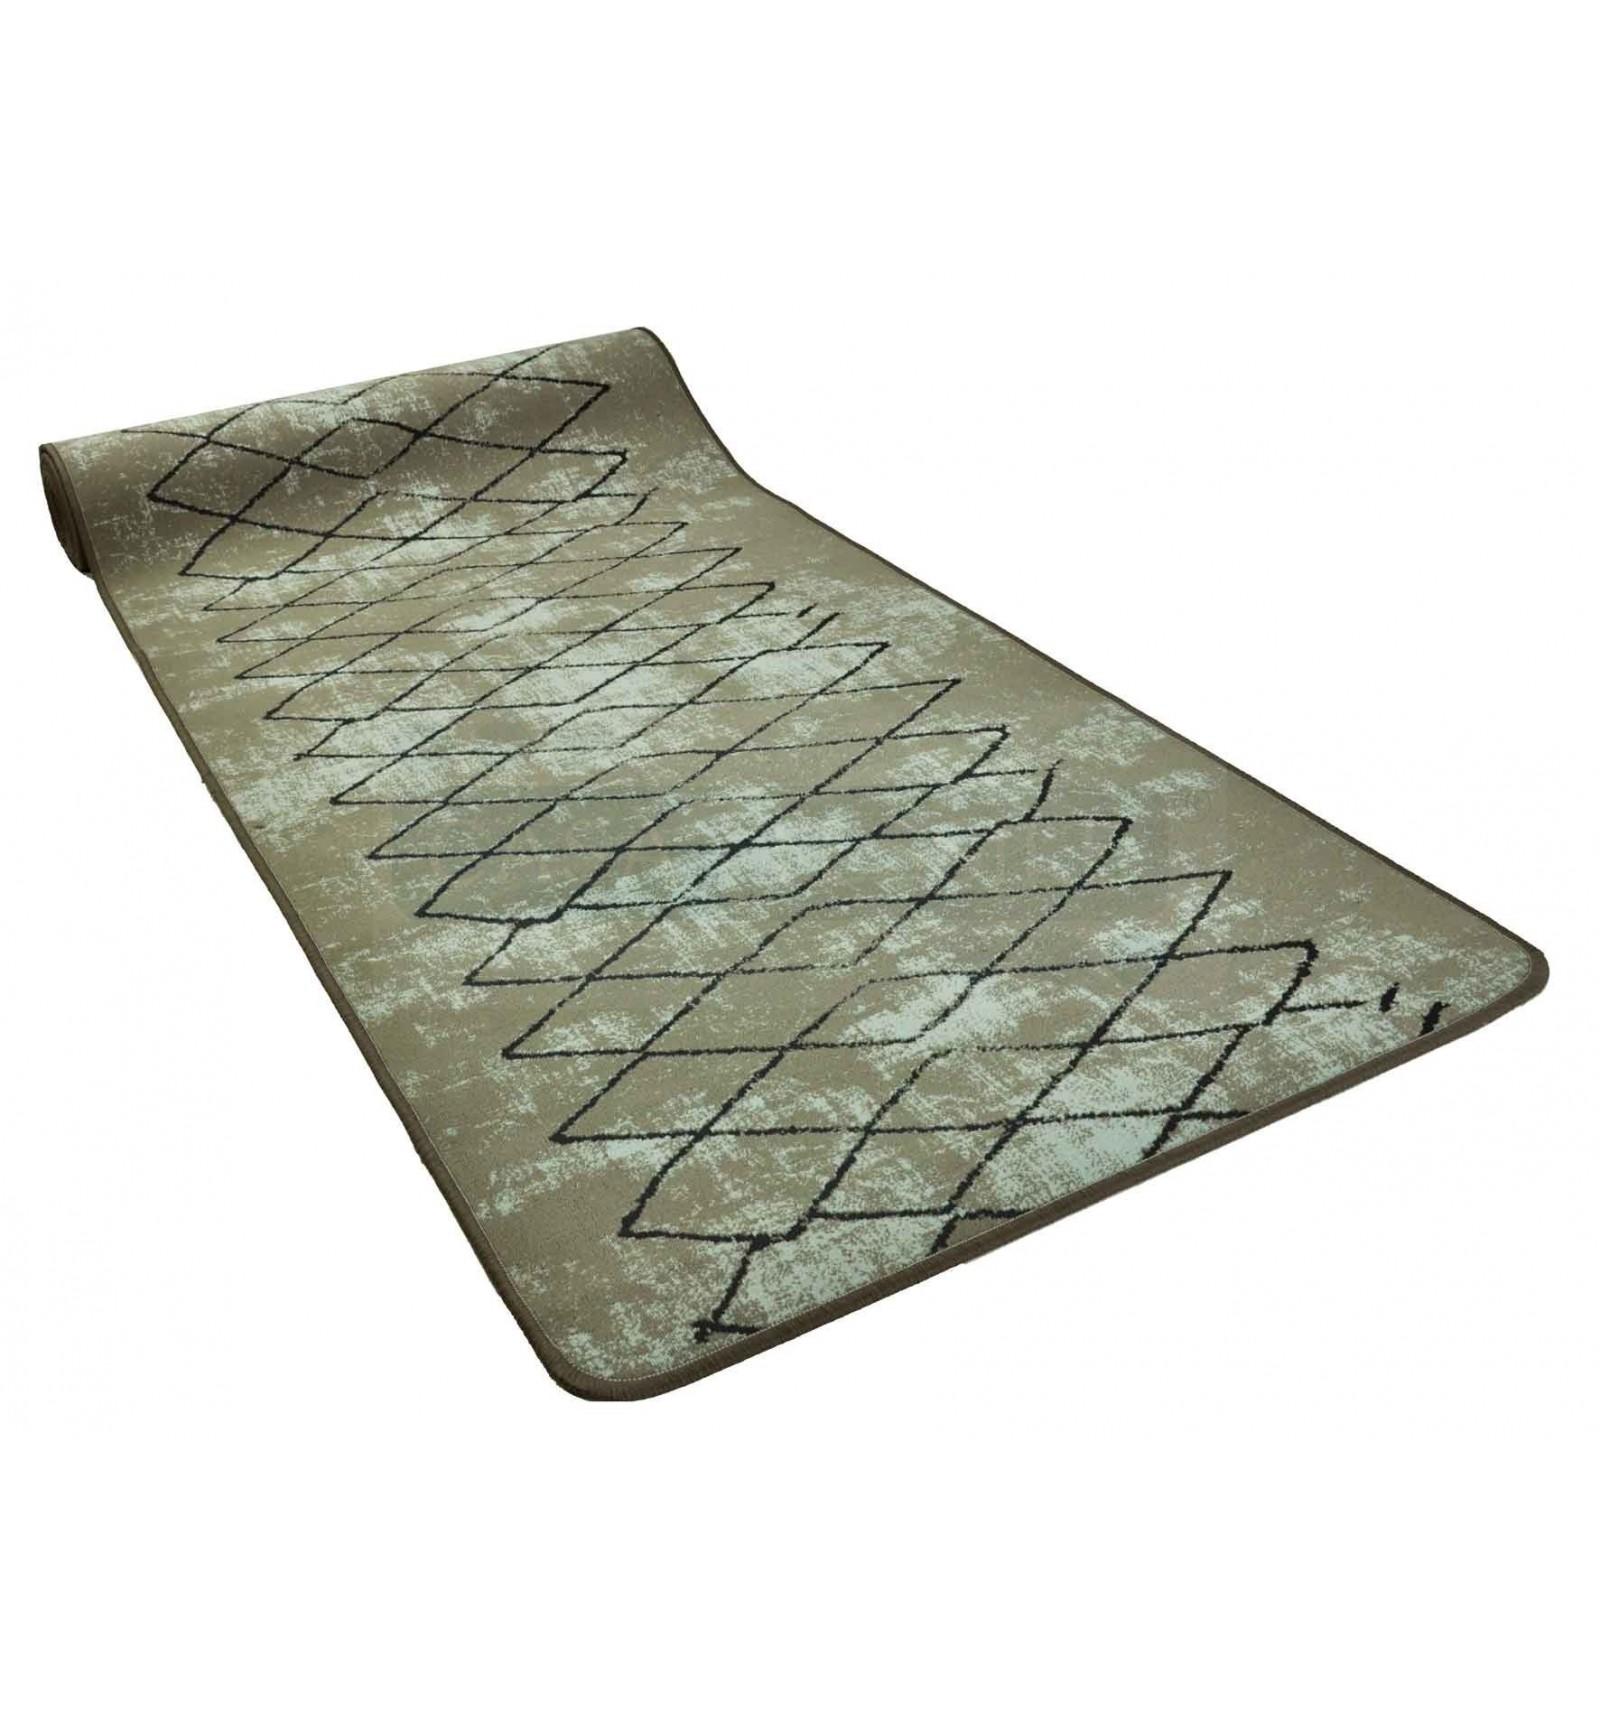 Full Size of Runder Teppich Küche Kunststoff Teppich Küche Spritzschutz Teppich Küche Teppich Küche Pflegeleicht Küche Teppich Küche